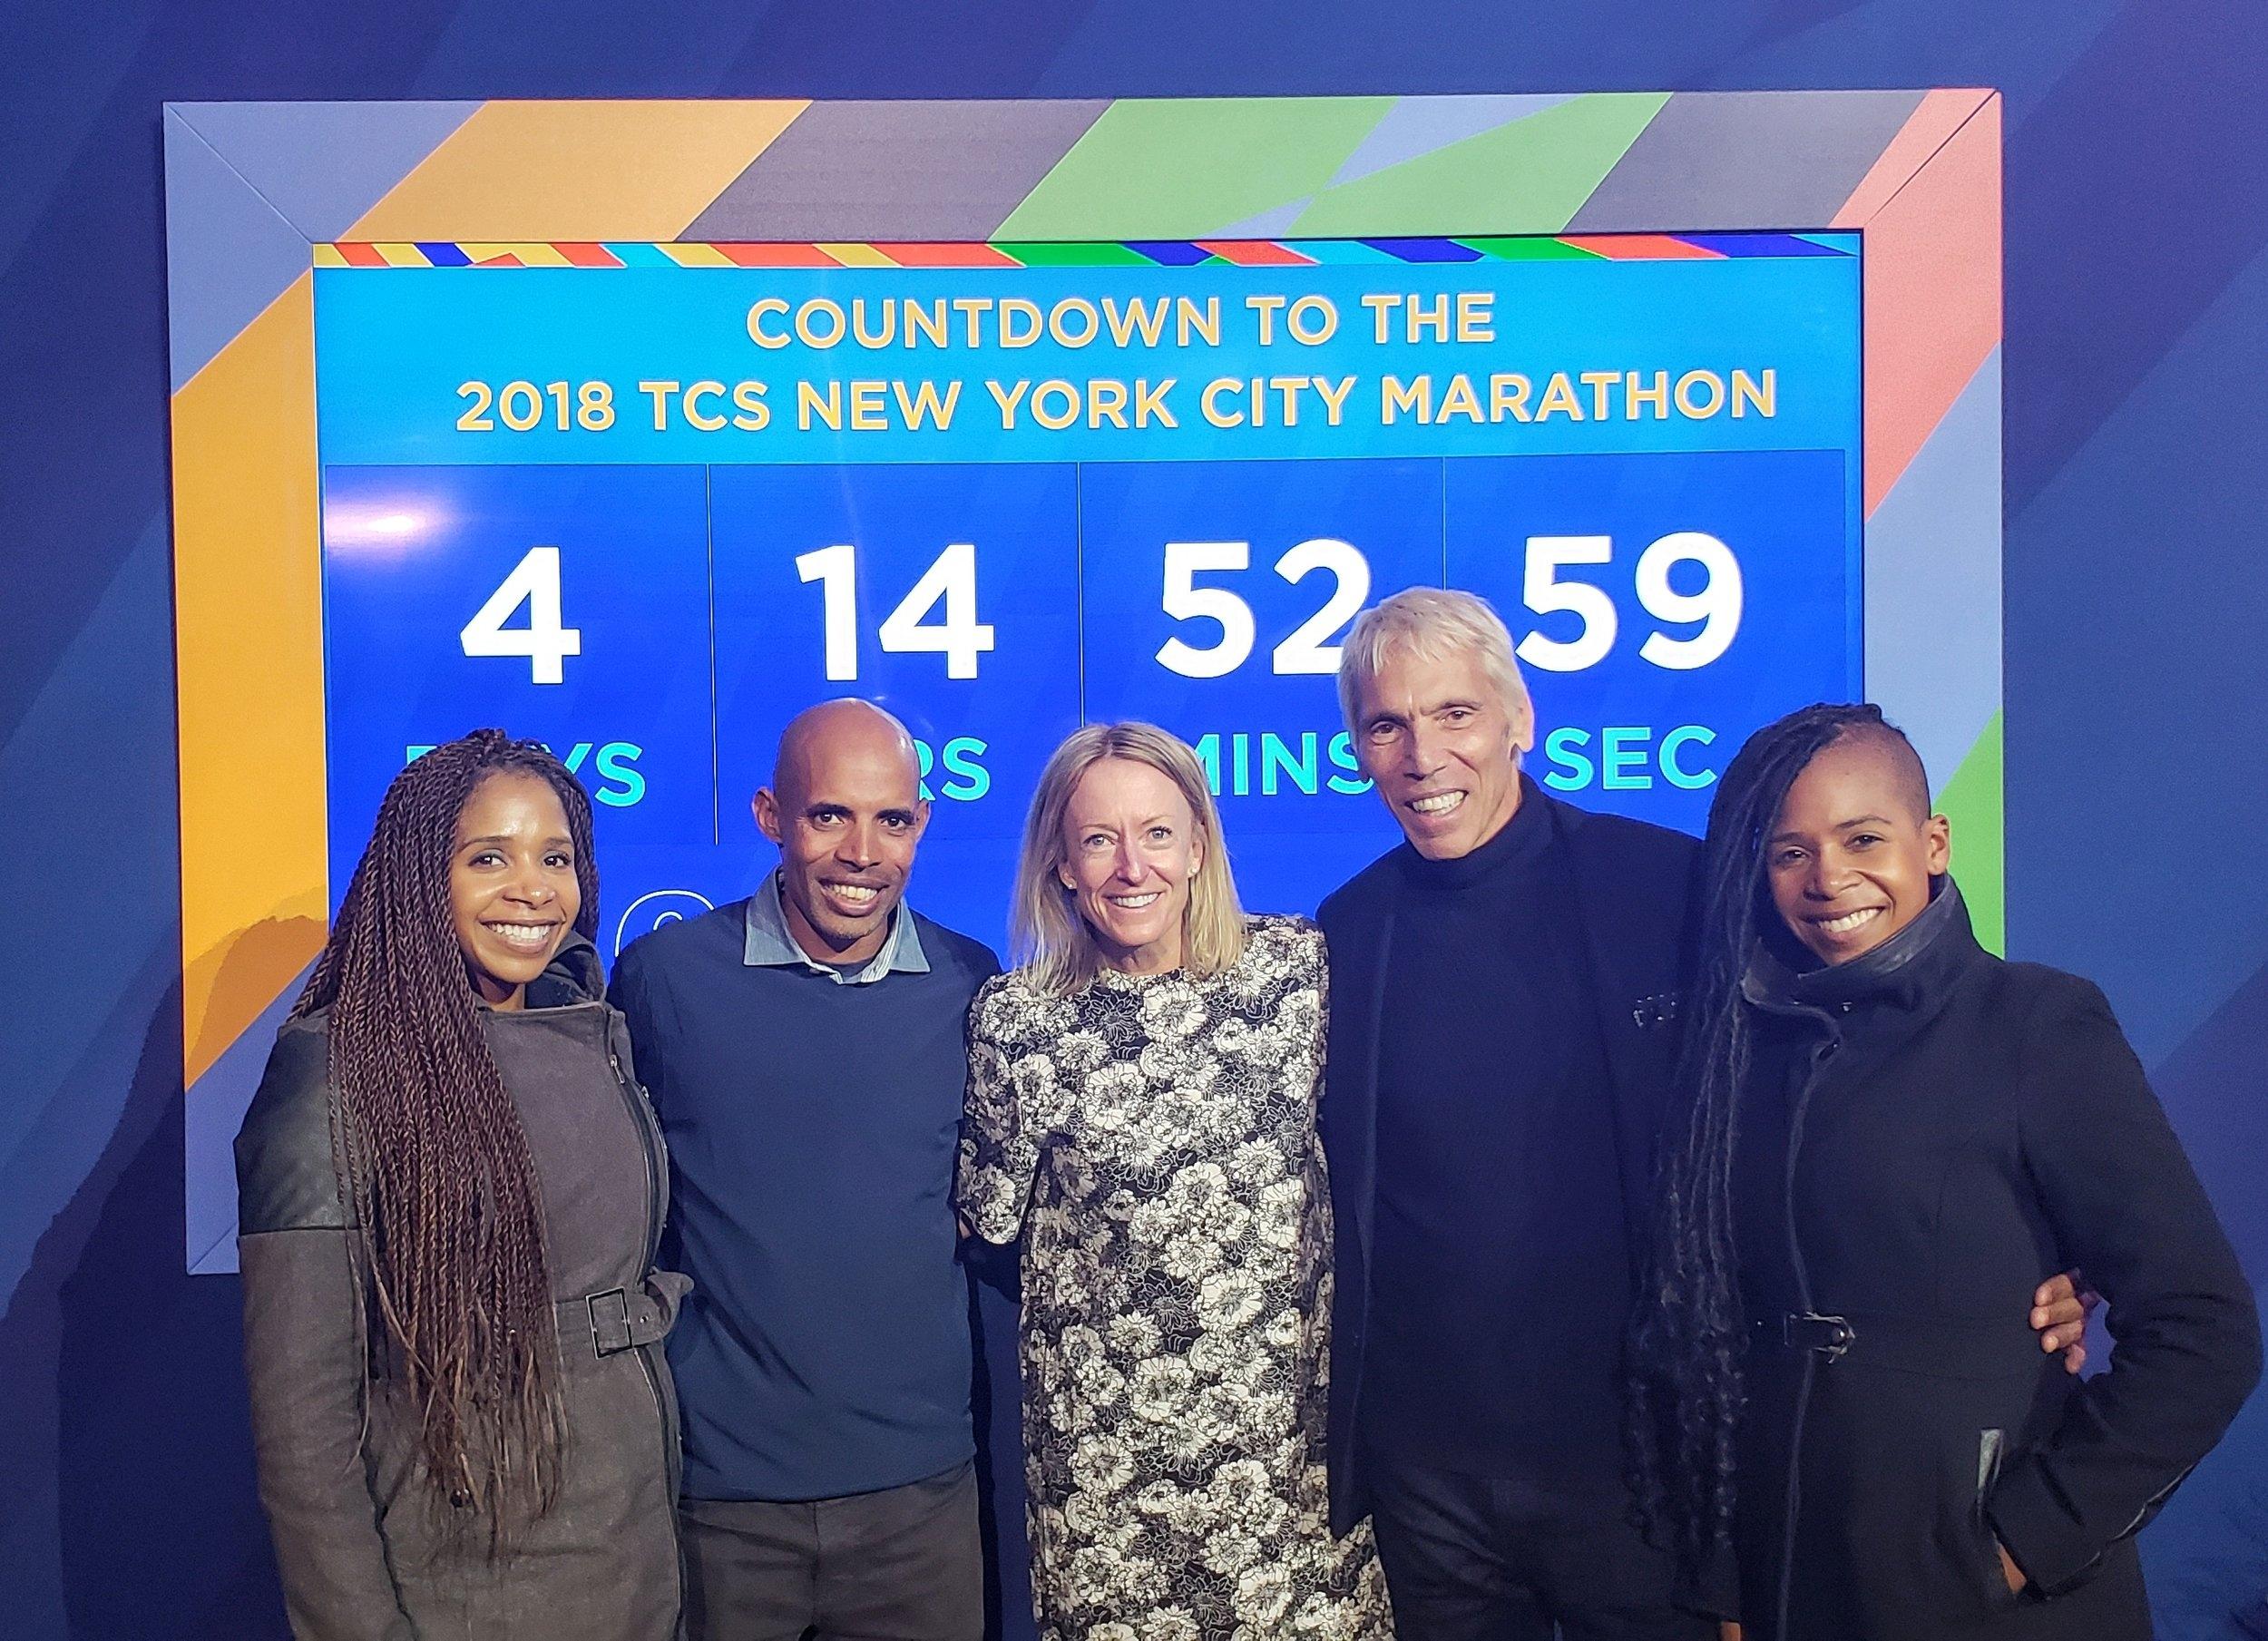 R to L: June, American elite runner Meb Keflezighi, American elite runner Deena Kastor and NYRR TCS marathon director Peter Ciaccia, Joy